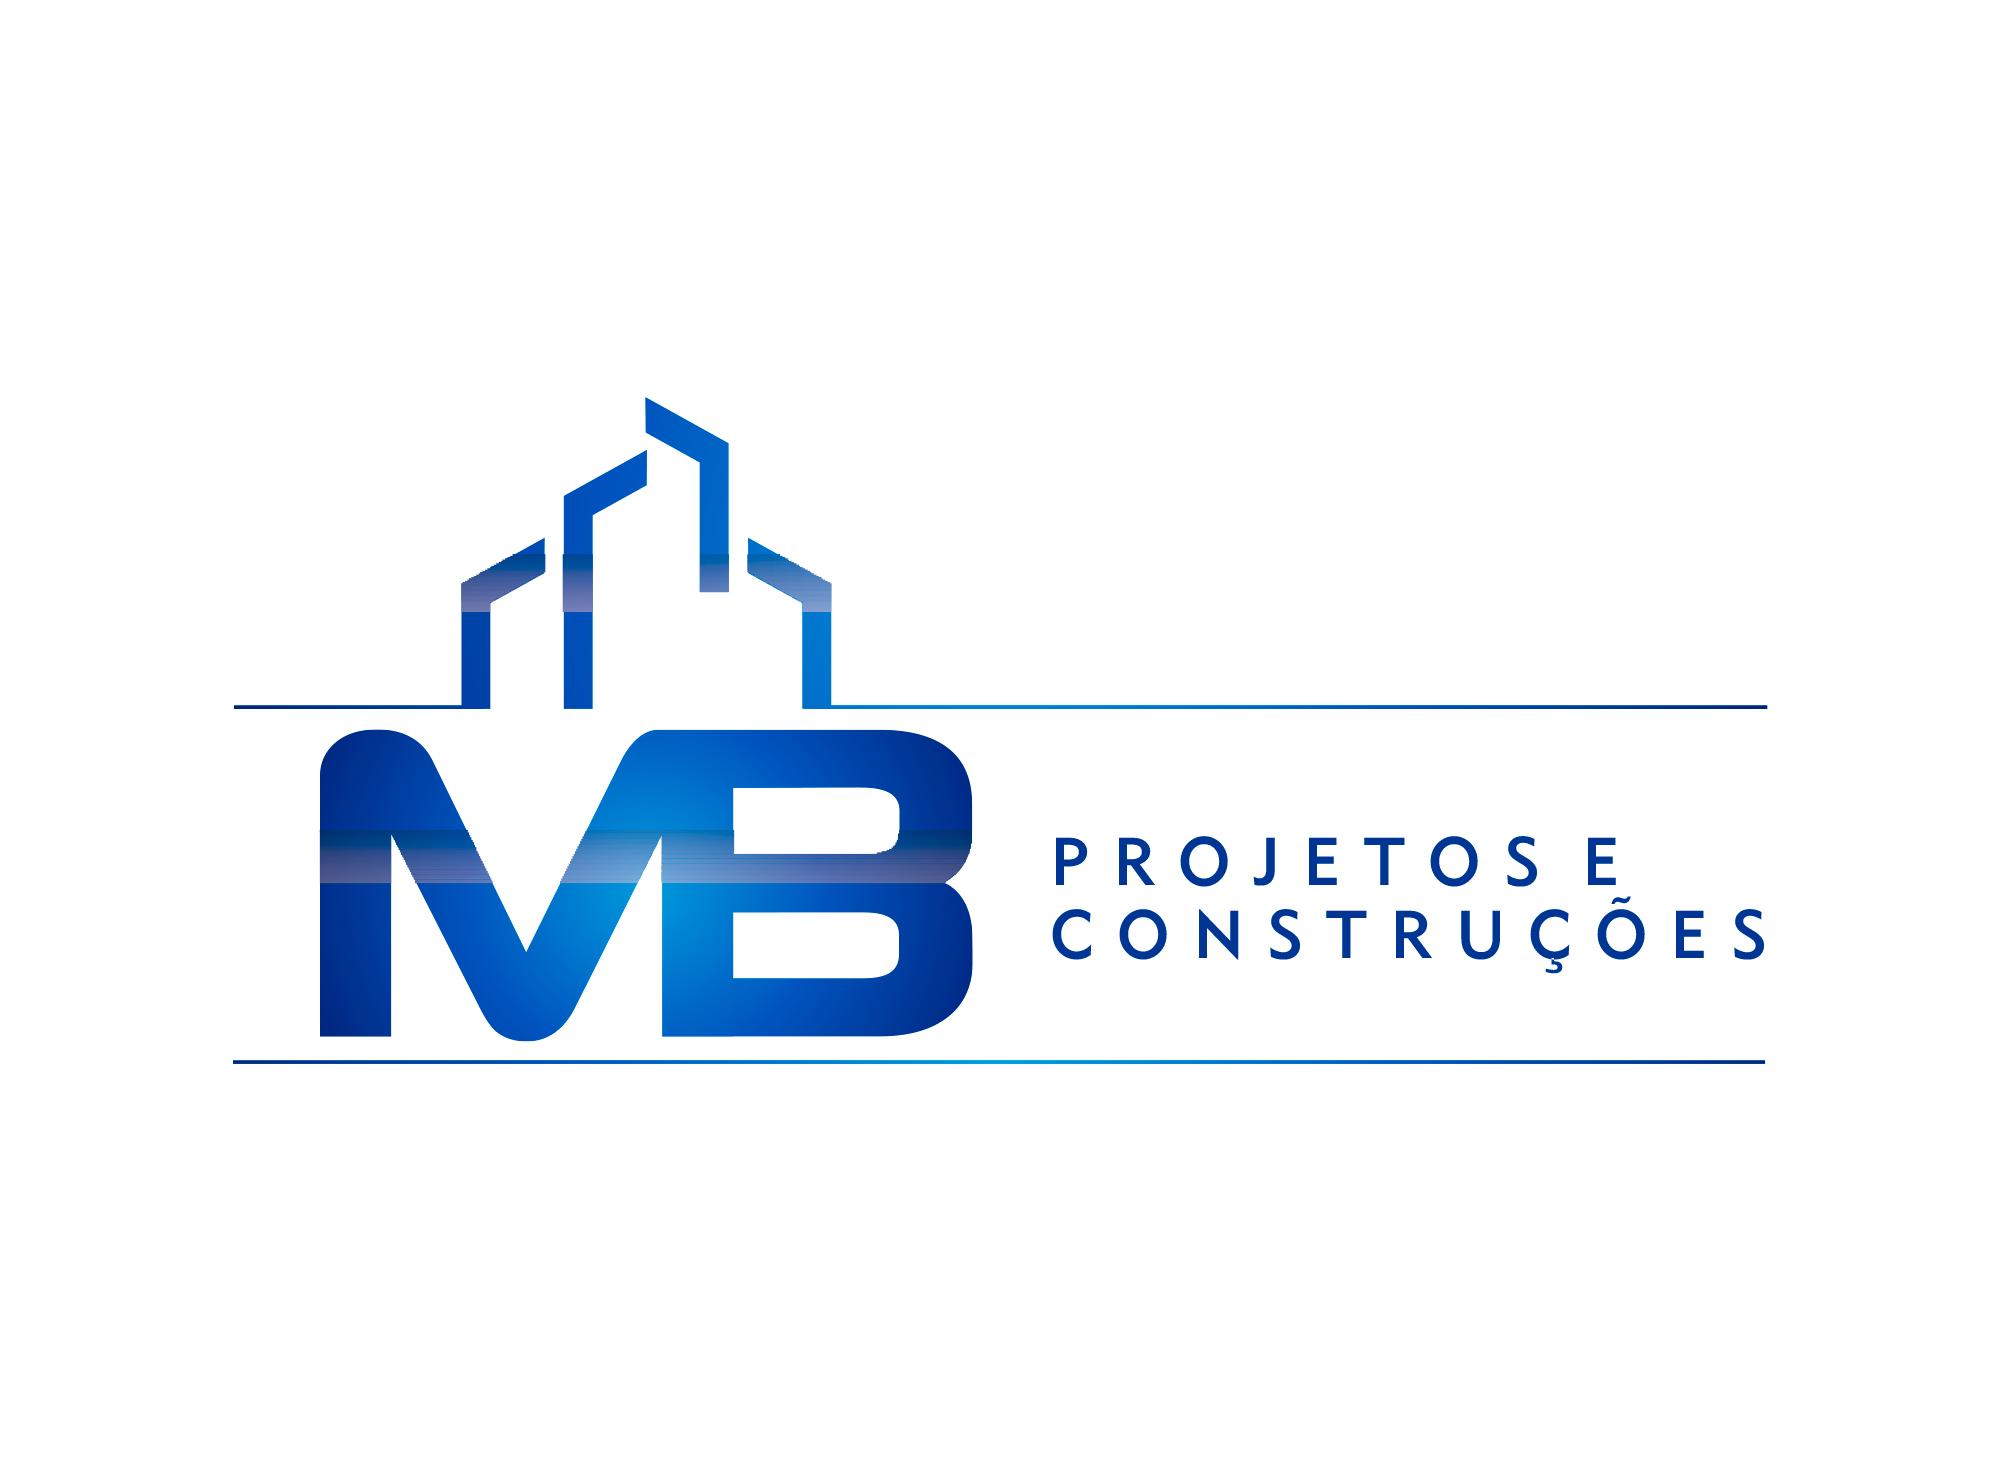 mb-projetos-construcoes-clientes-atendidos-agencia-diretriz-digital-marketing-fortaleza